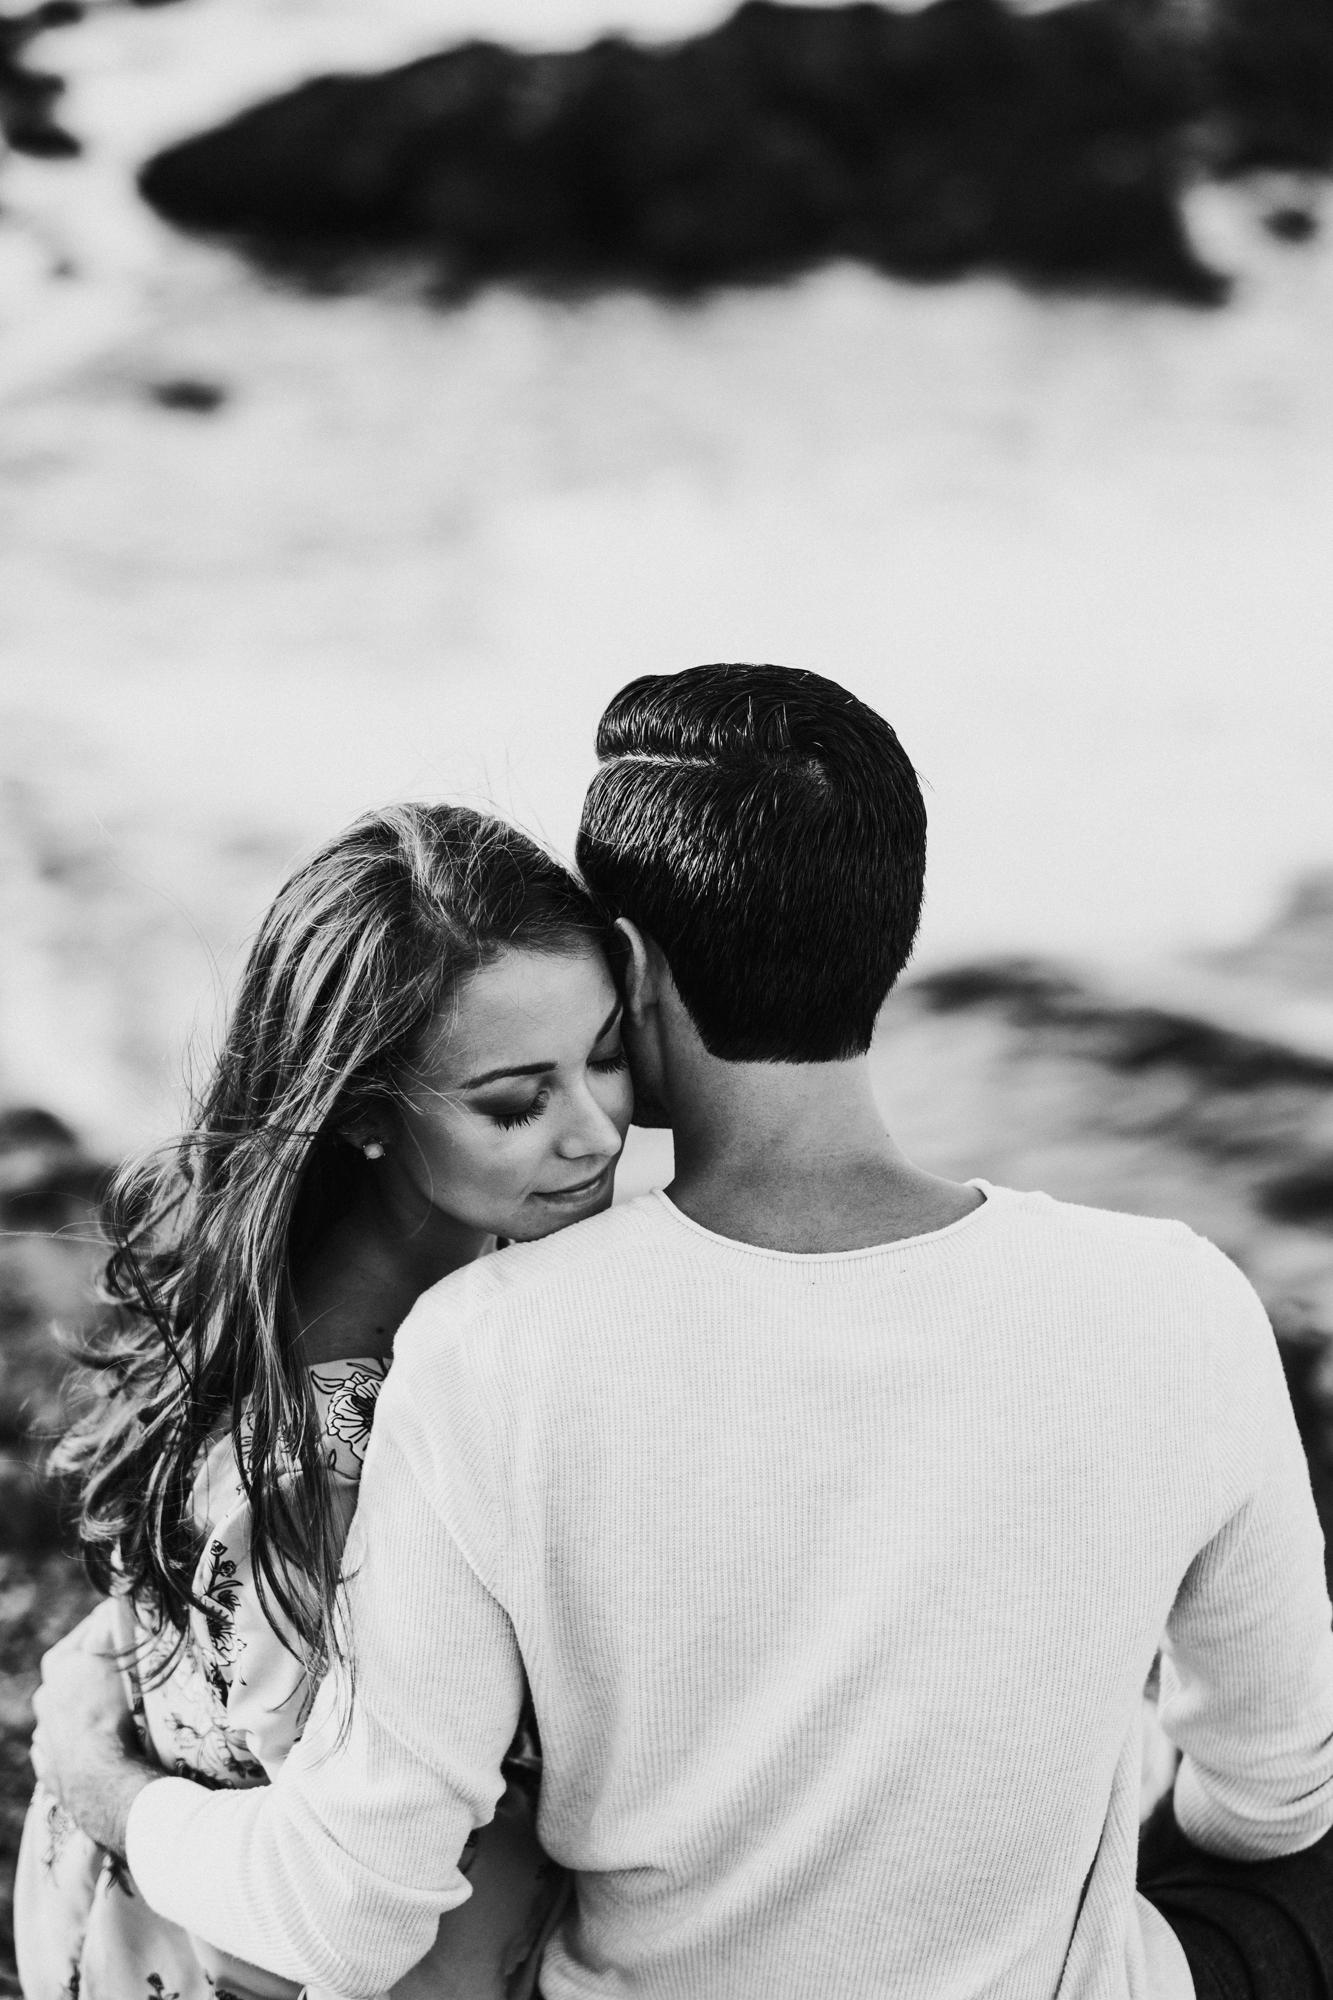 Wedding_Francis_Boucher_Engagement_Nahant_MA_2018-8.jpg